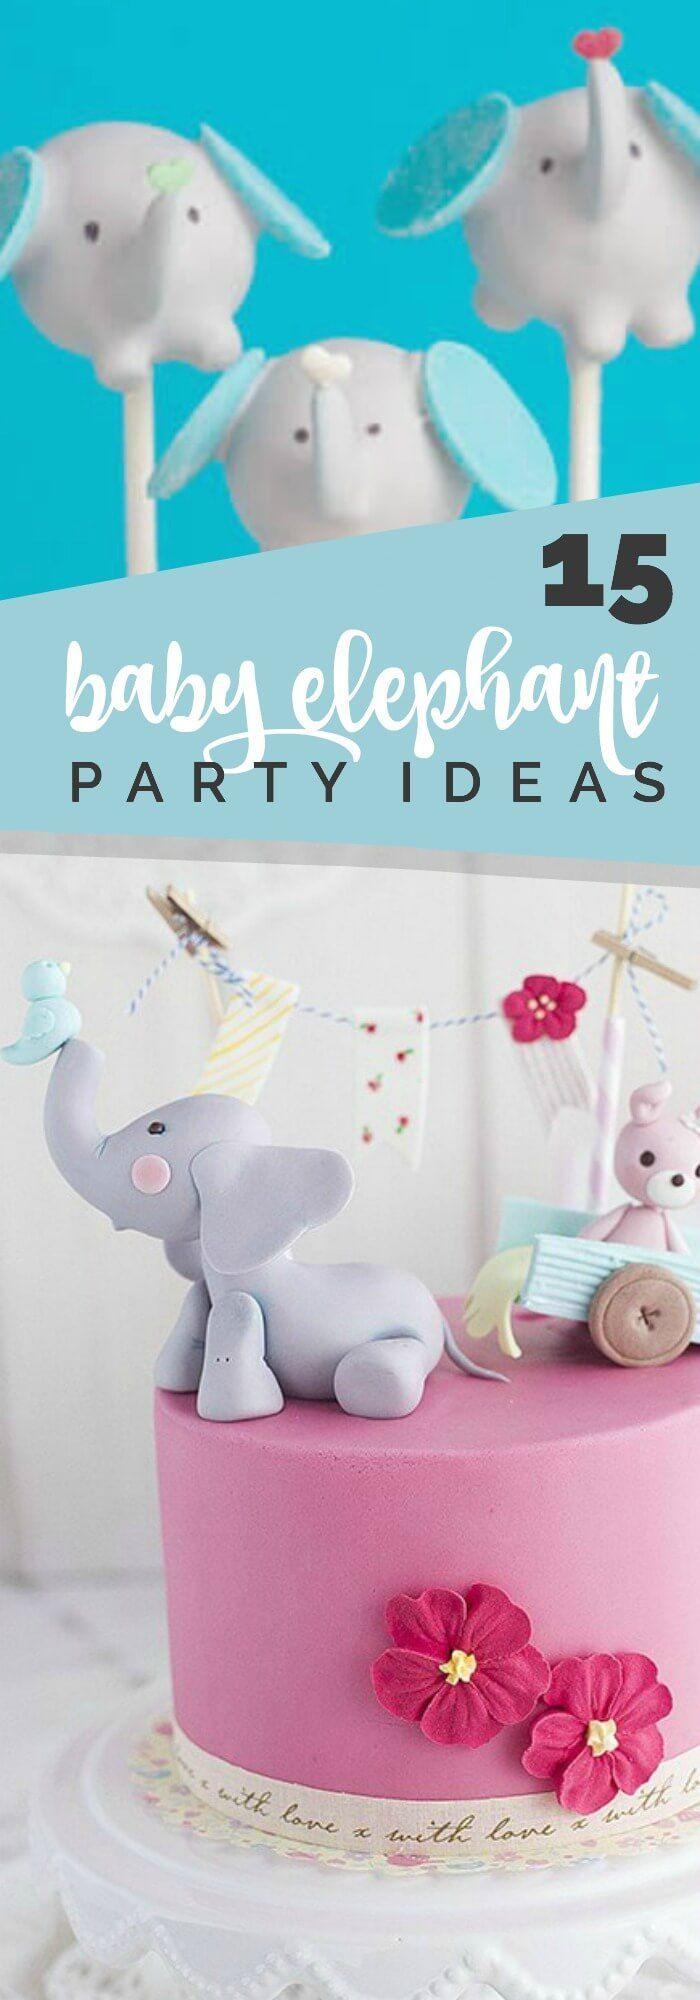 15 Creative Baby Elephant Party Ideas